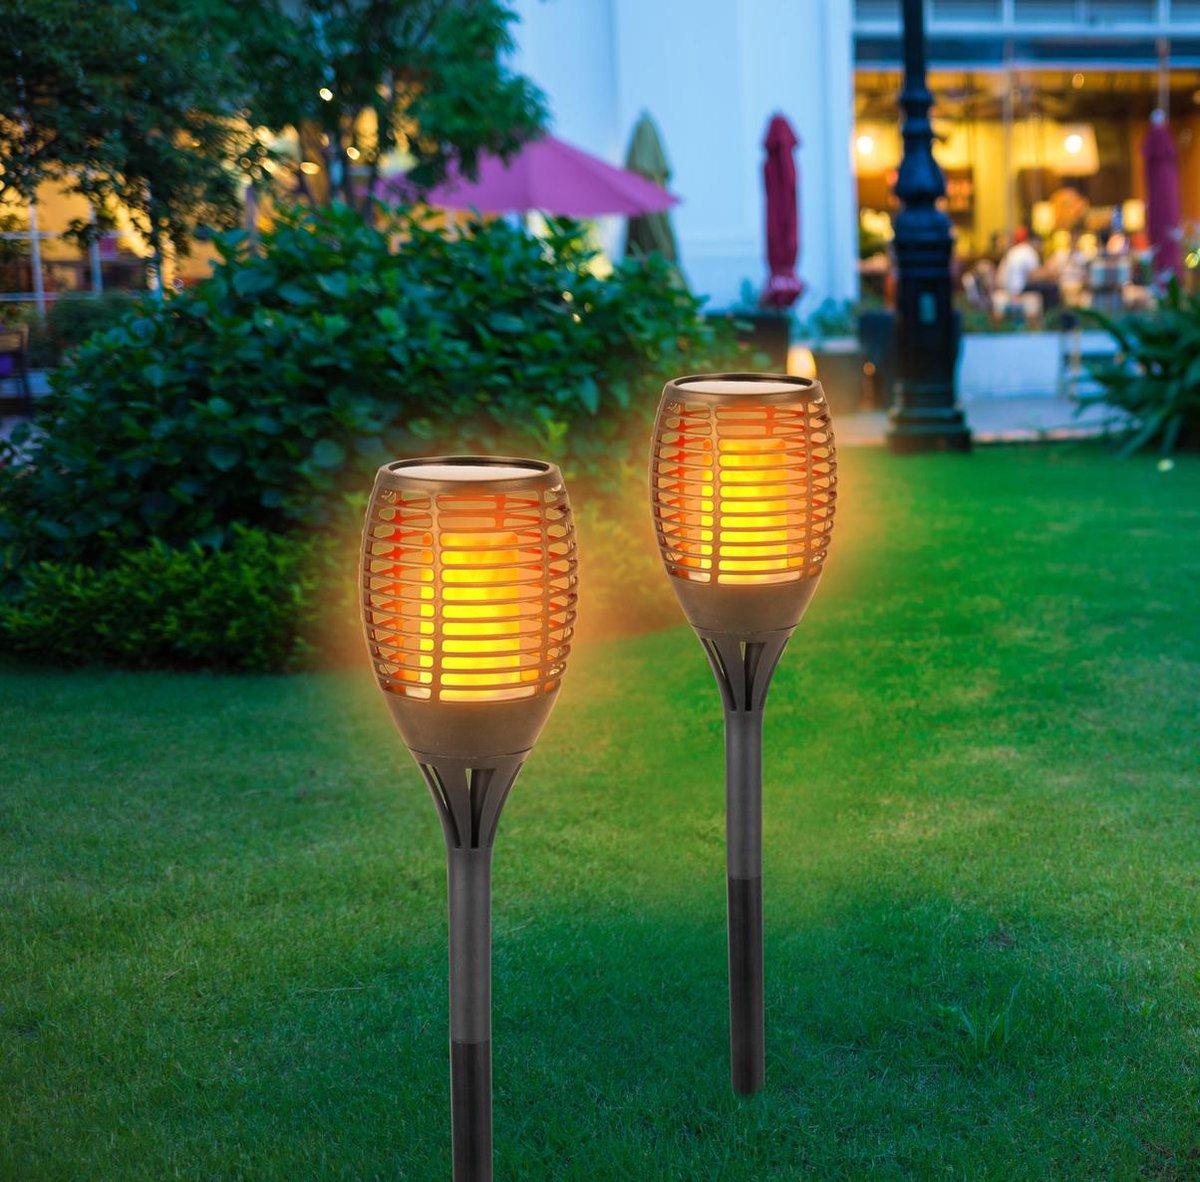 Grundig Solar Prikspot - LED - Zonne energie - 1 stuks - Zwart -  12cm x 77cm